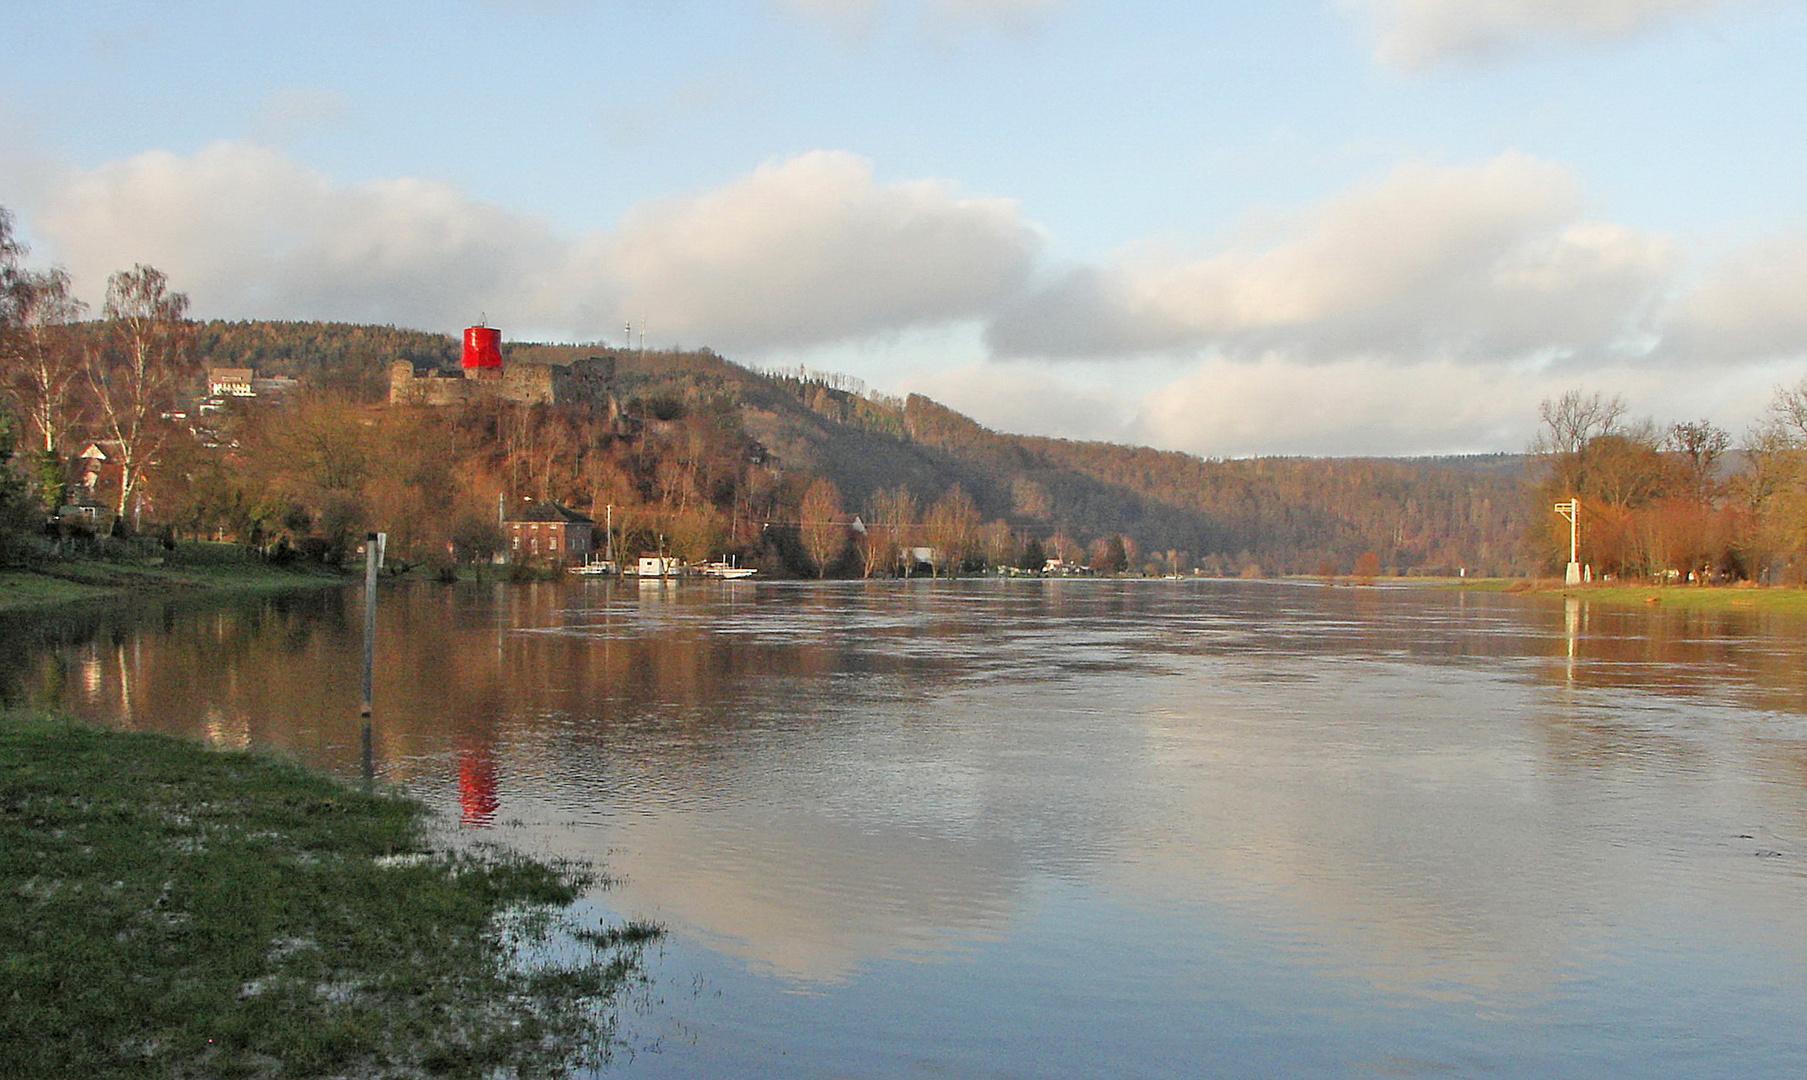 Land unter - Polle a.d. Weser